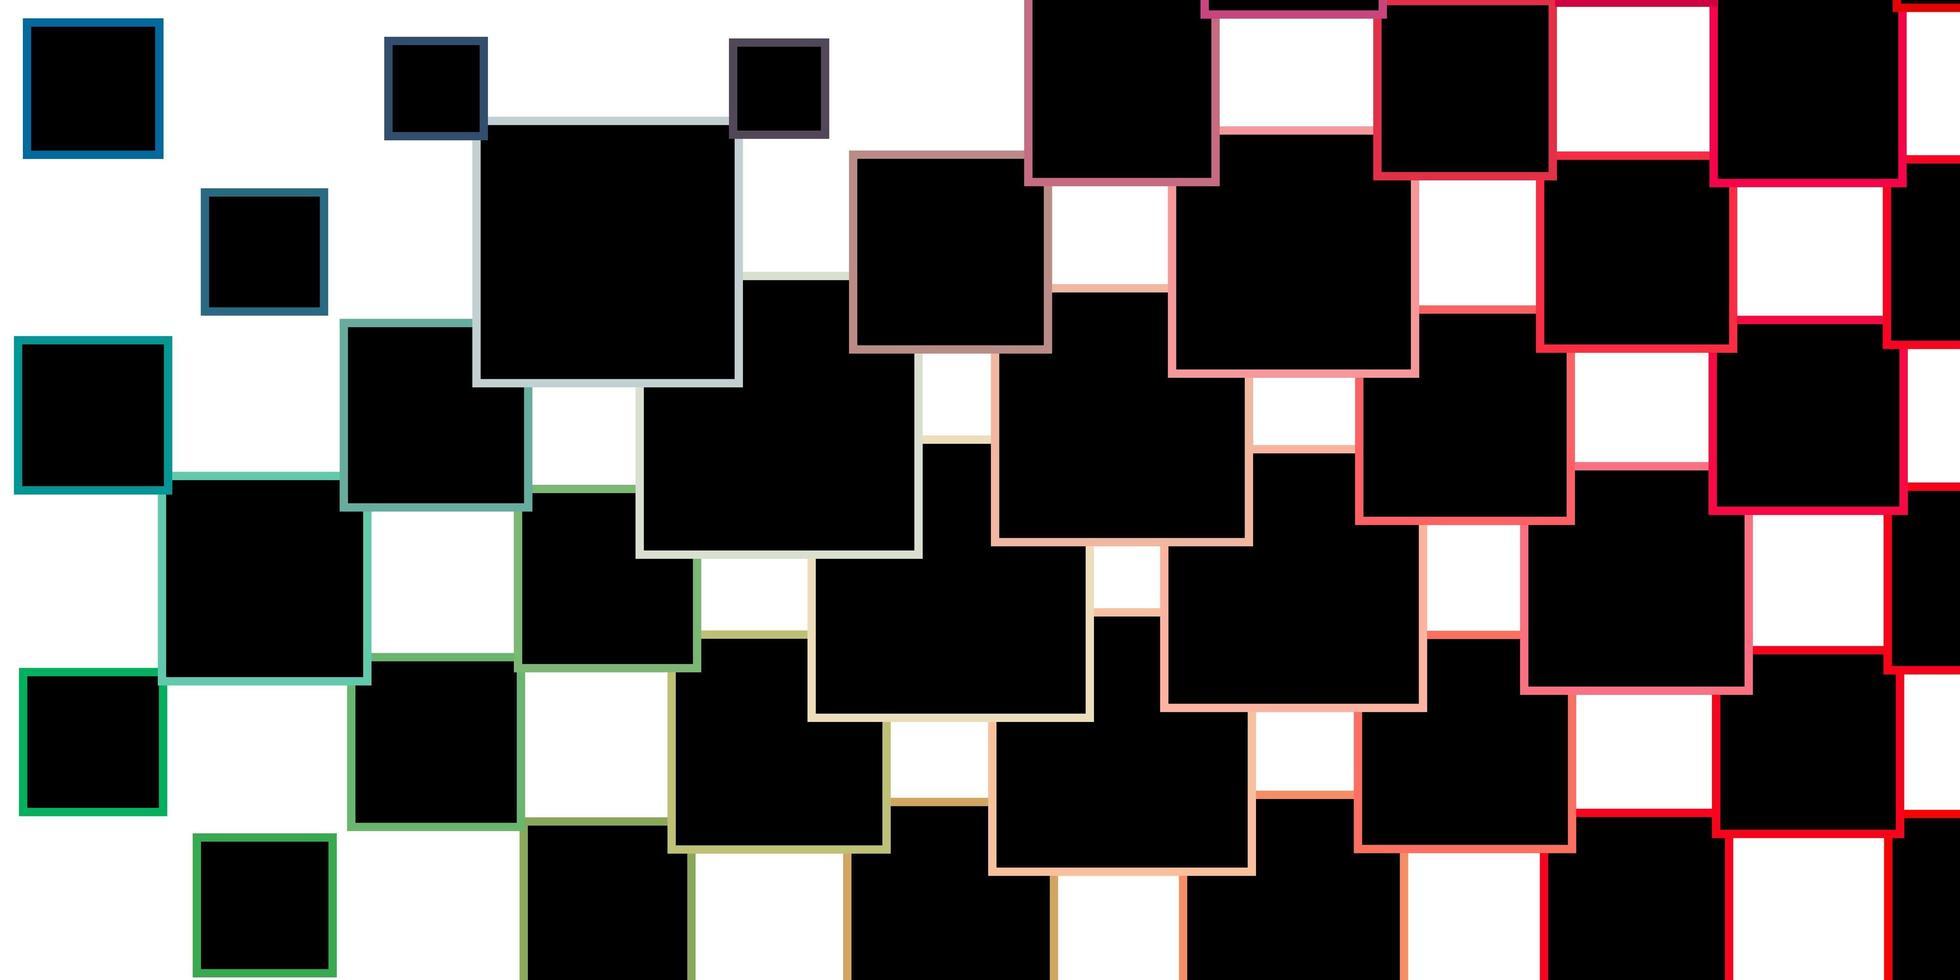 hellgrünes, rotes Vektormuster im quadratischen Stil. vektor